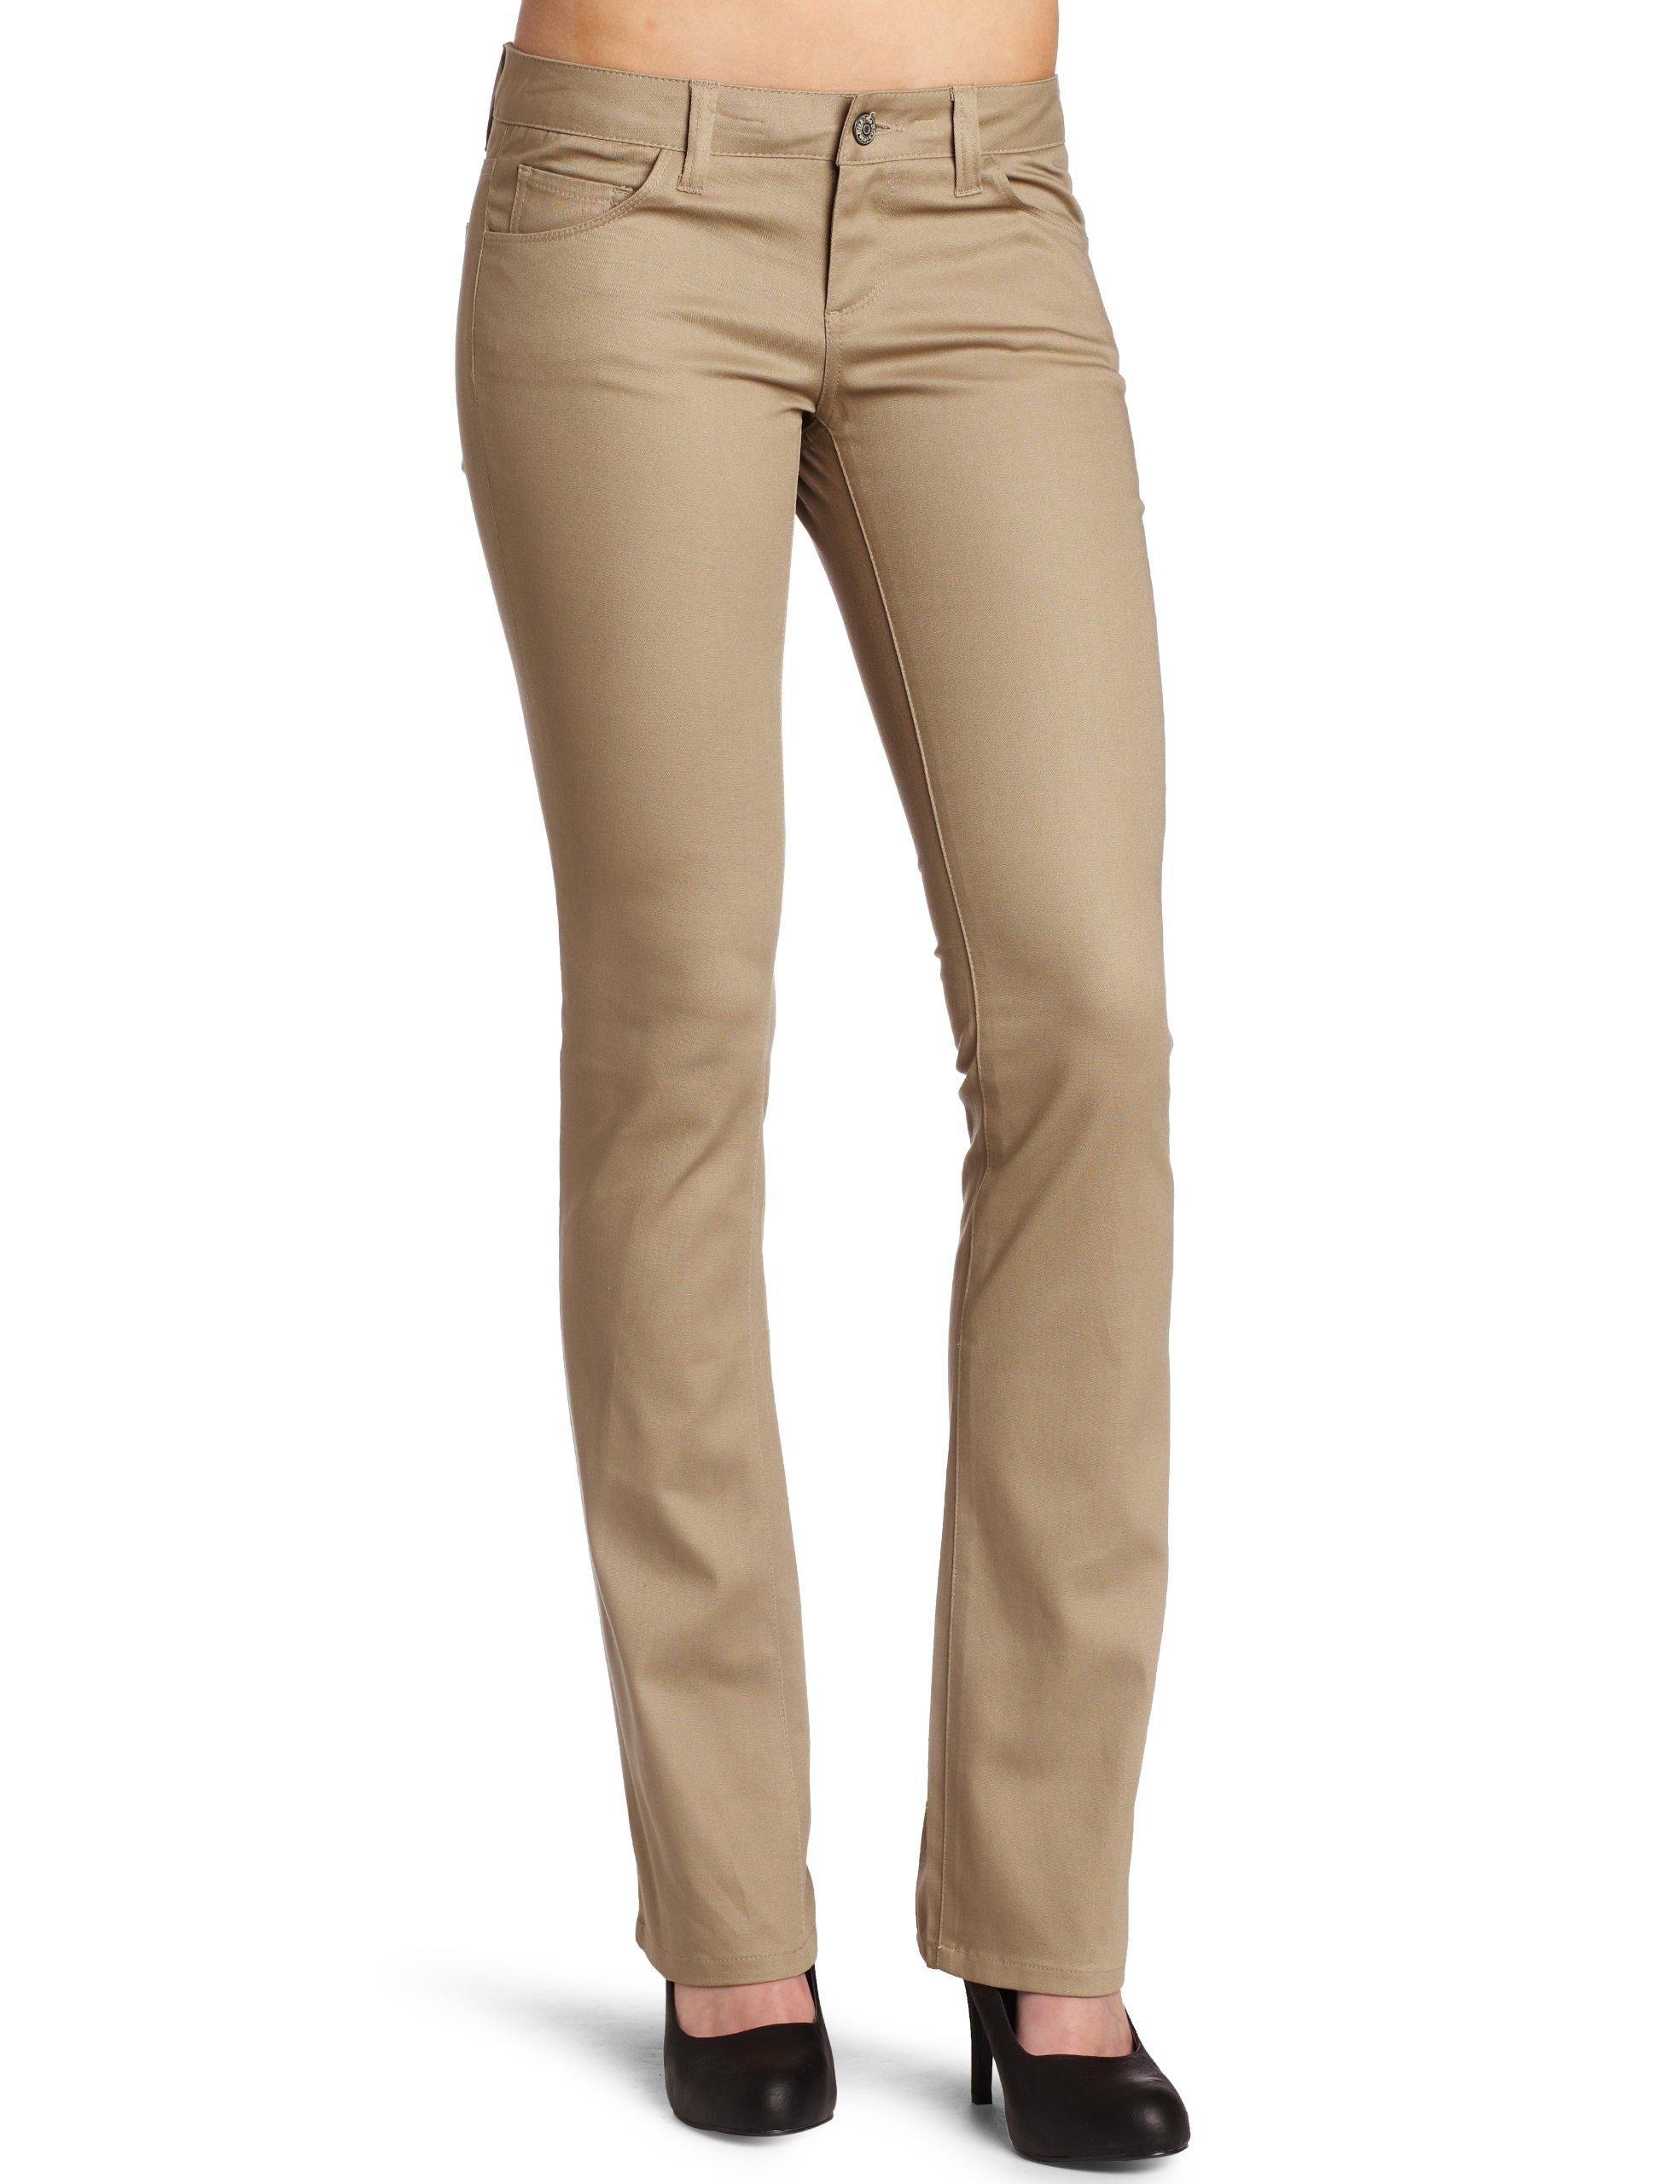 Dickies Girl Juniors 5 Pocket Straight Leg Pant,Khaki,5